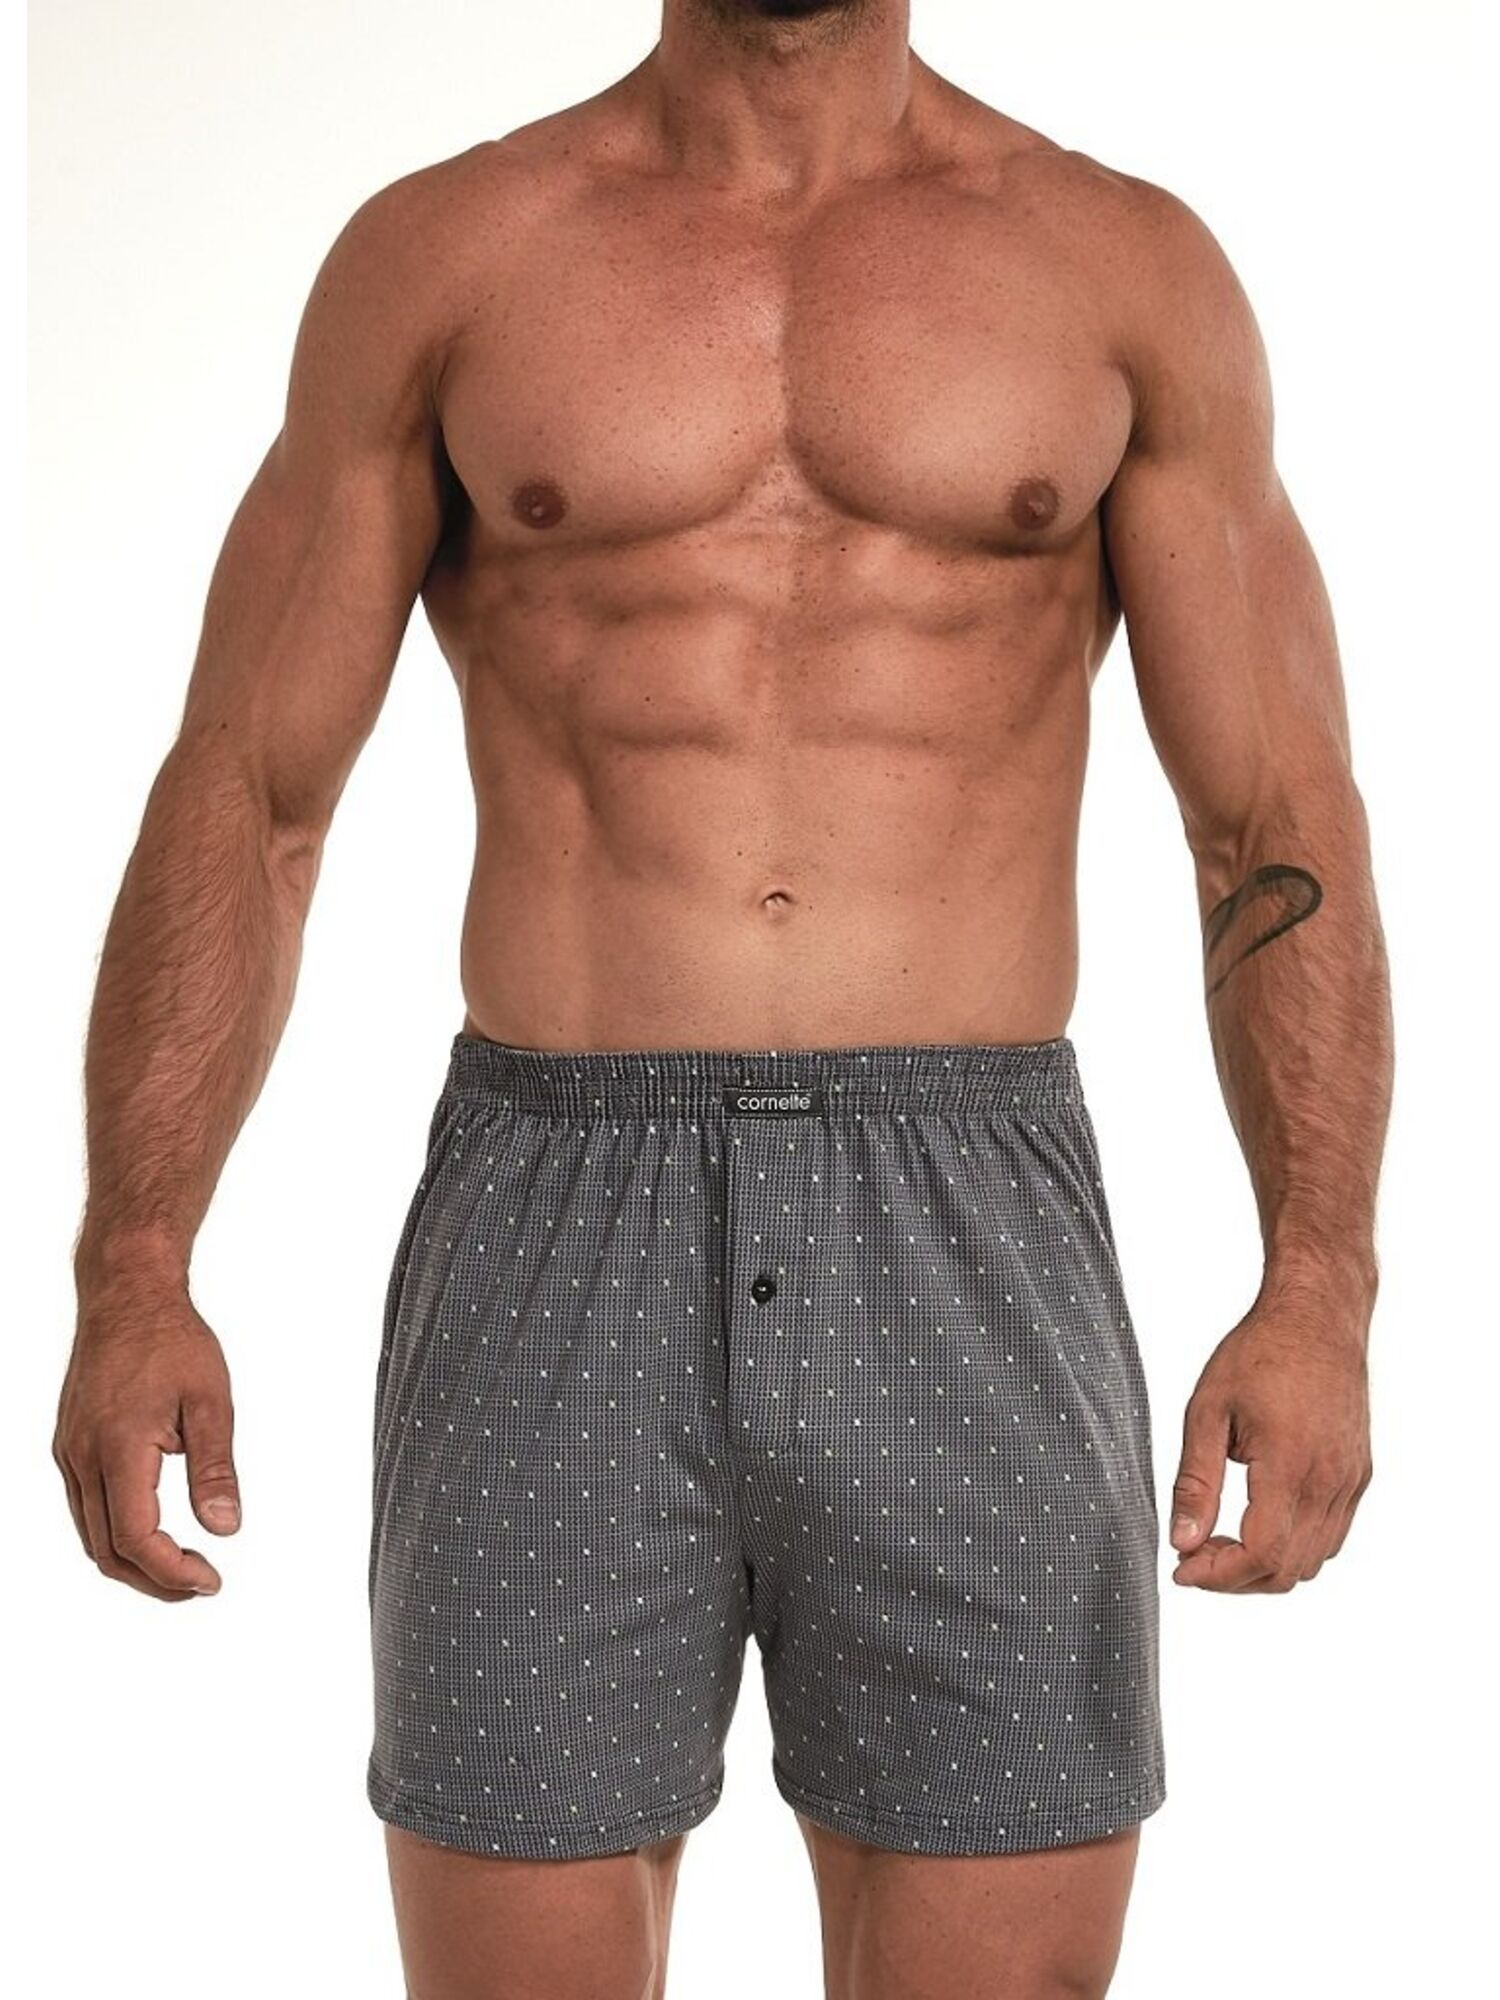 Трусы мужские боксеры из хлопка Comfort 002/008-6 серый, CORNETTE